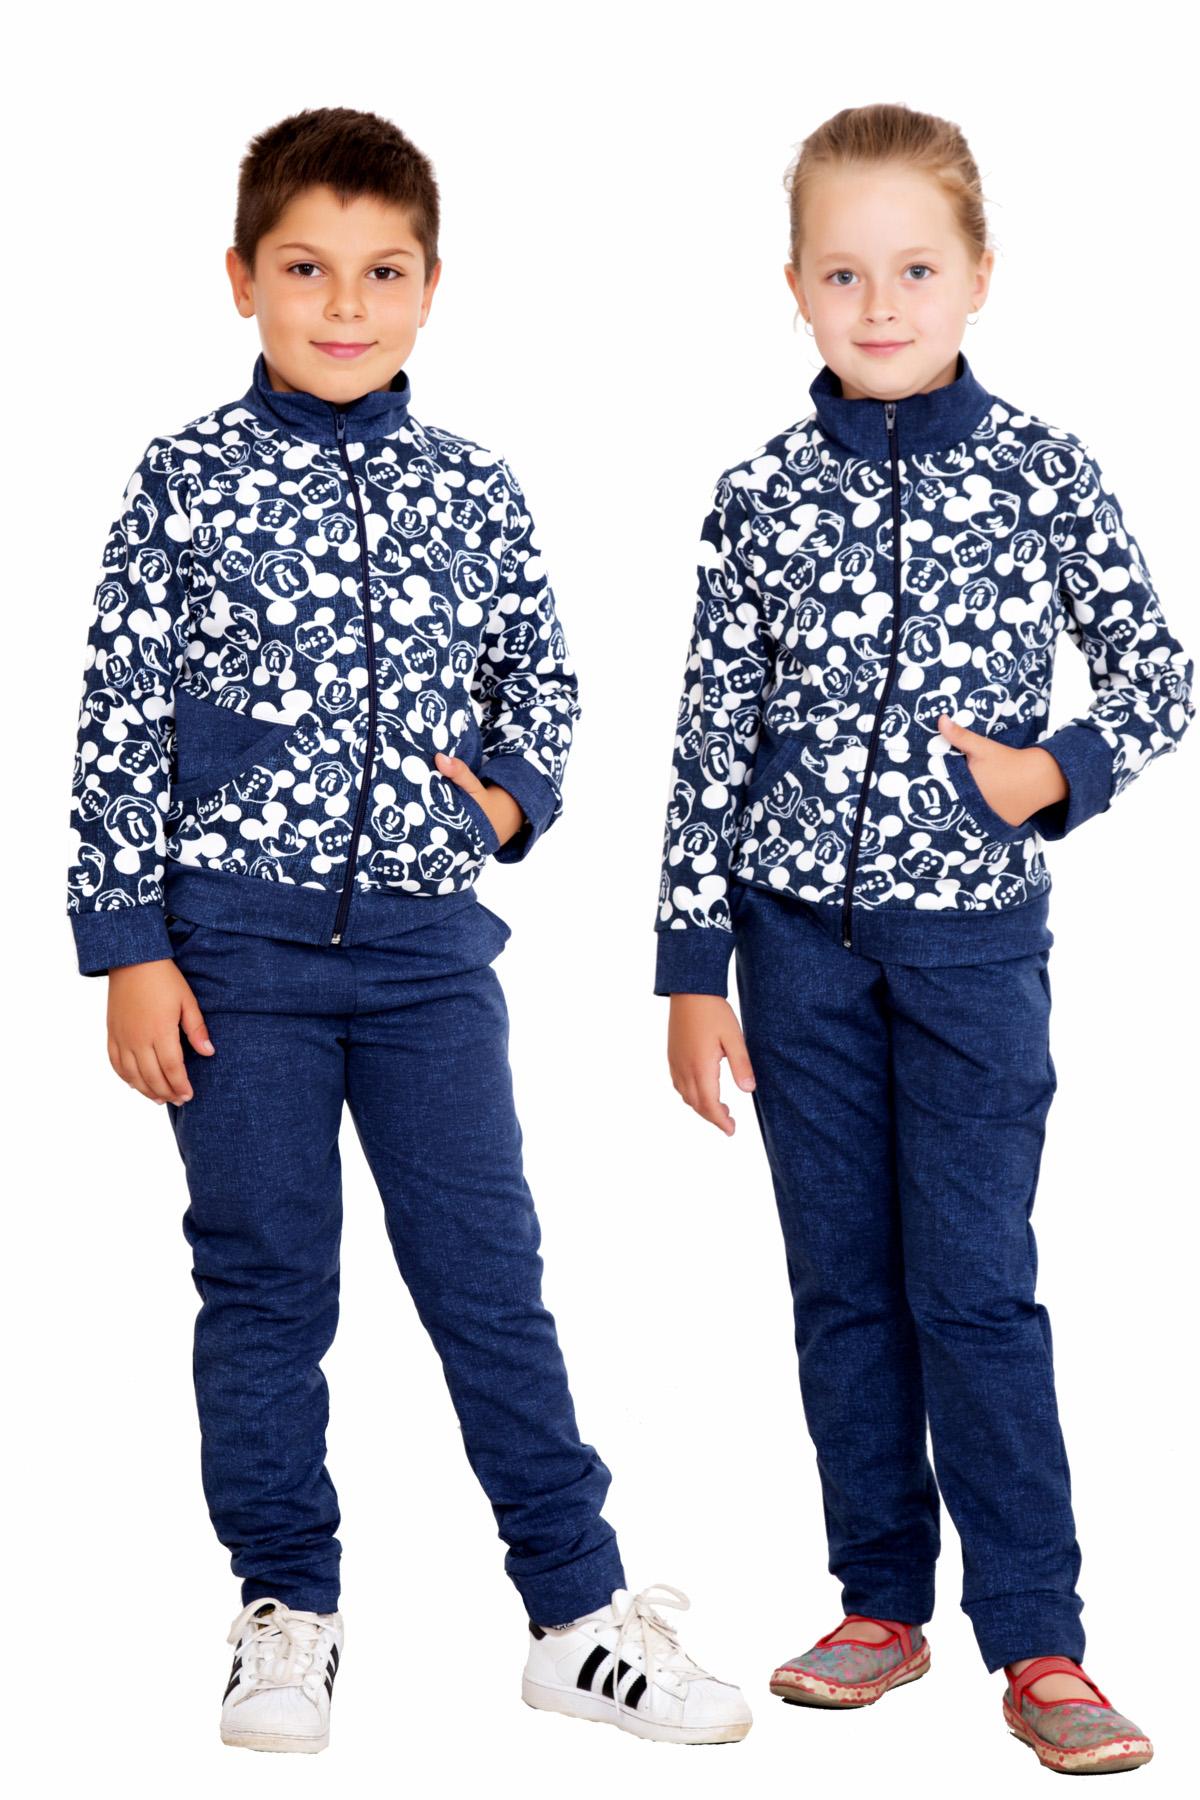 Дет. костюм Егоза р. 30Костюмы<br><br><br>Тип: Дет. костюм<br>Размер: 30<br>Материал: Футер